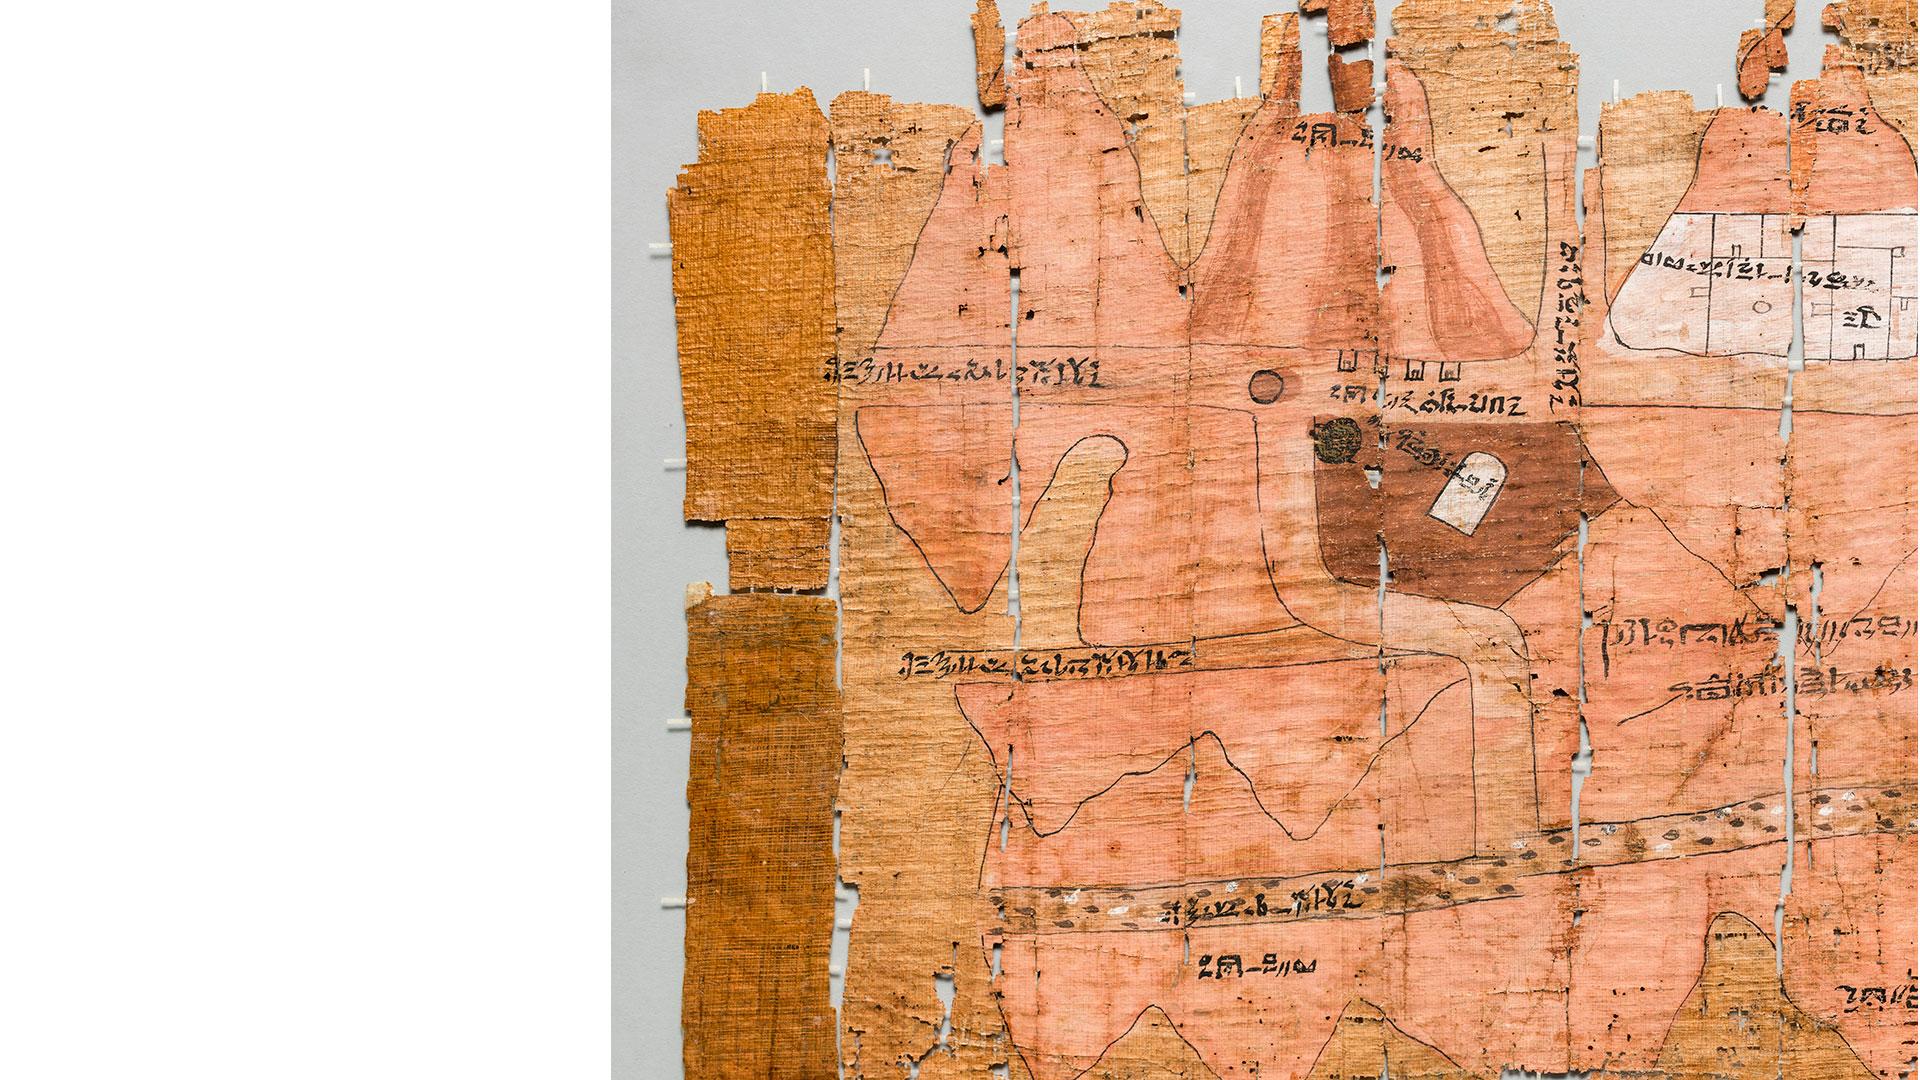 https://collezionepapiri.museoegizio.it/assets/home-page-img.jpg